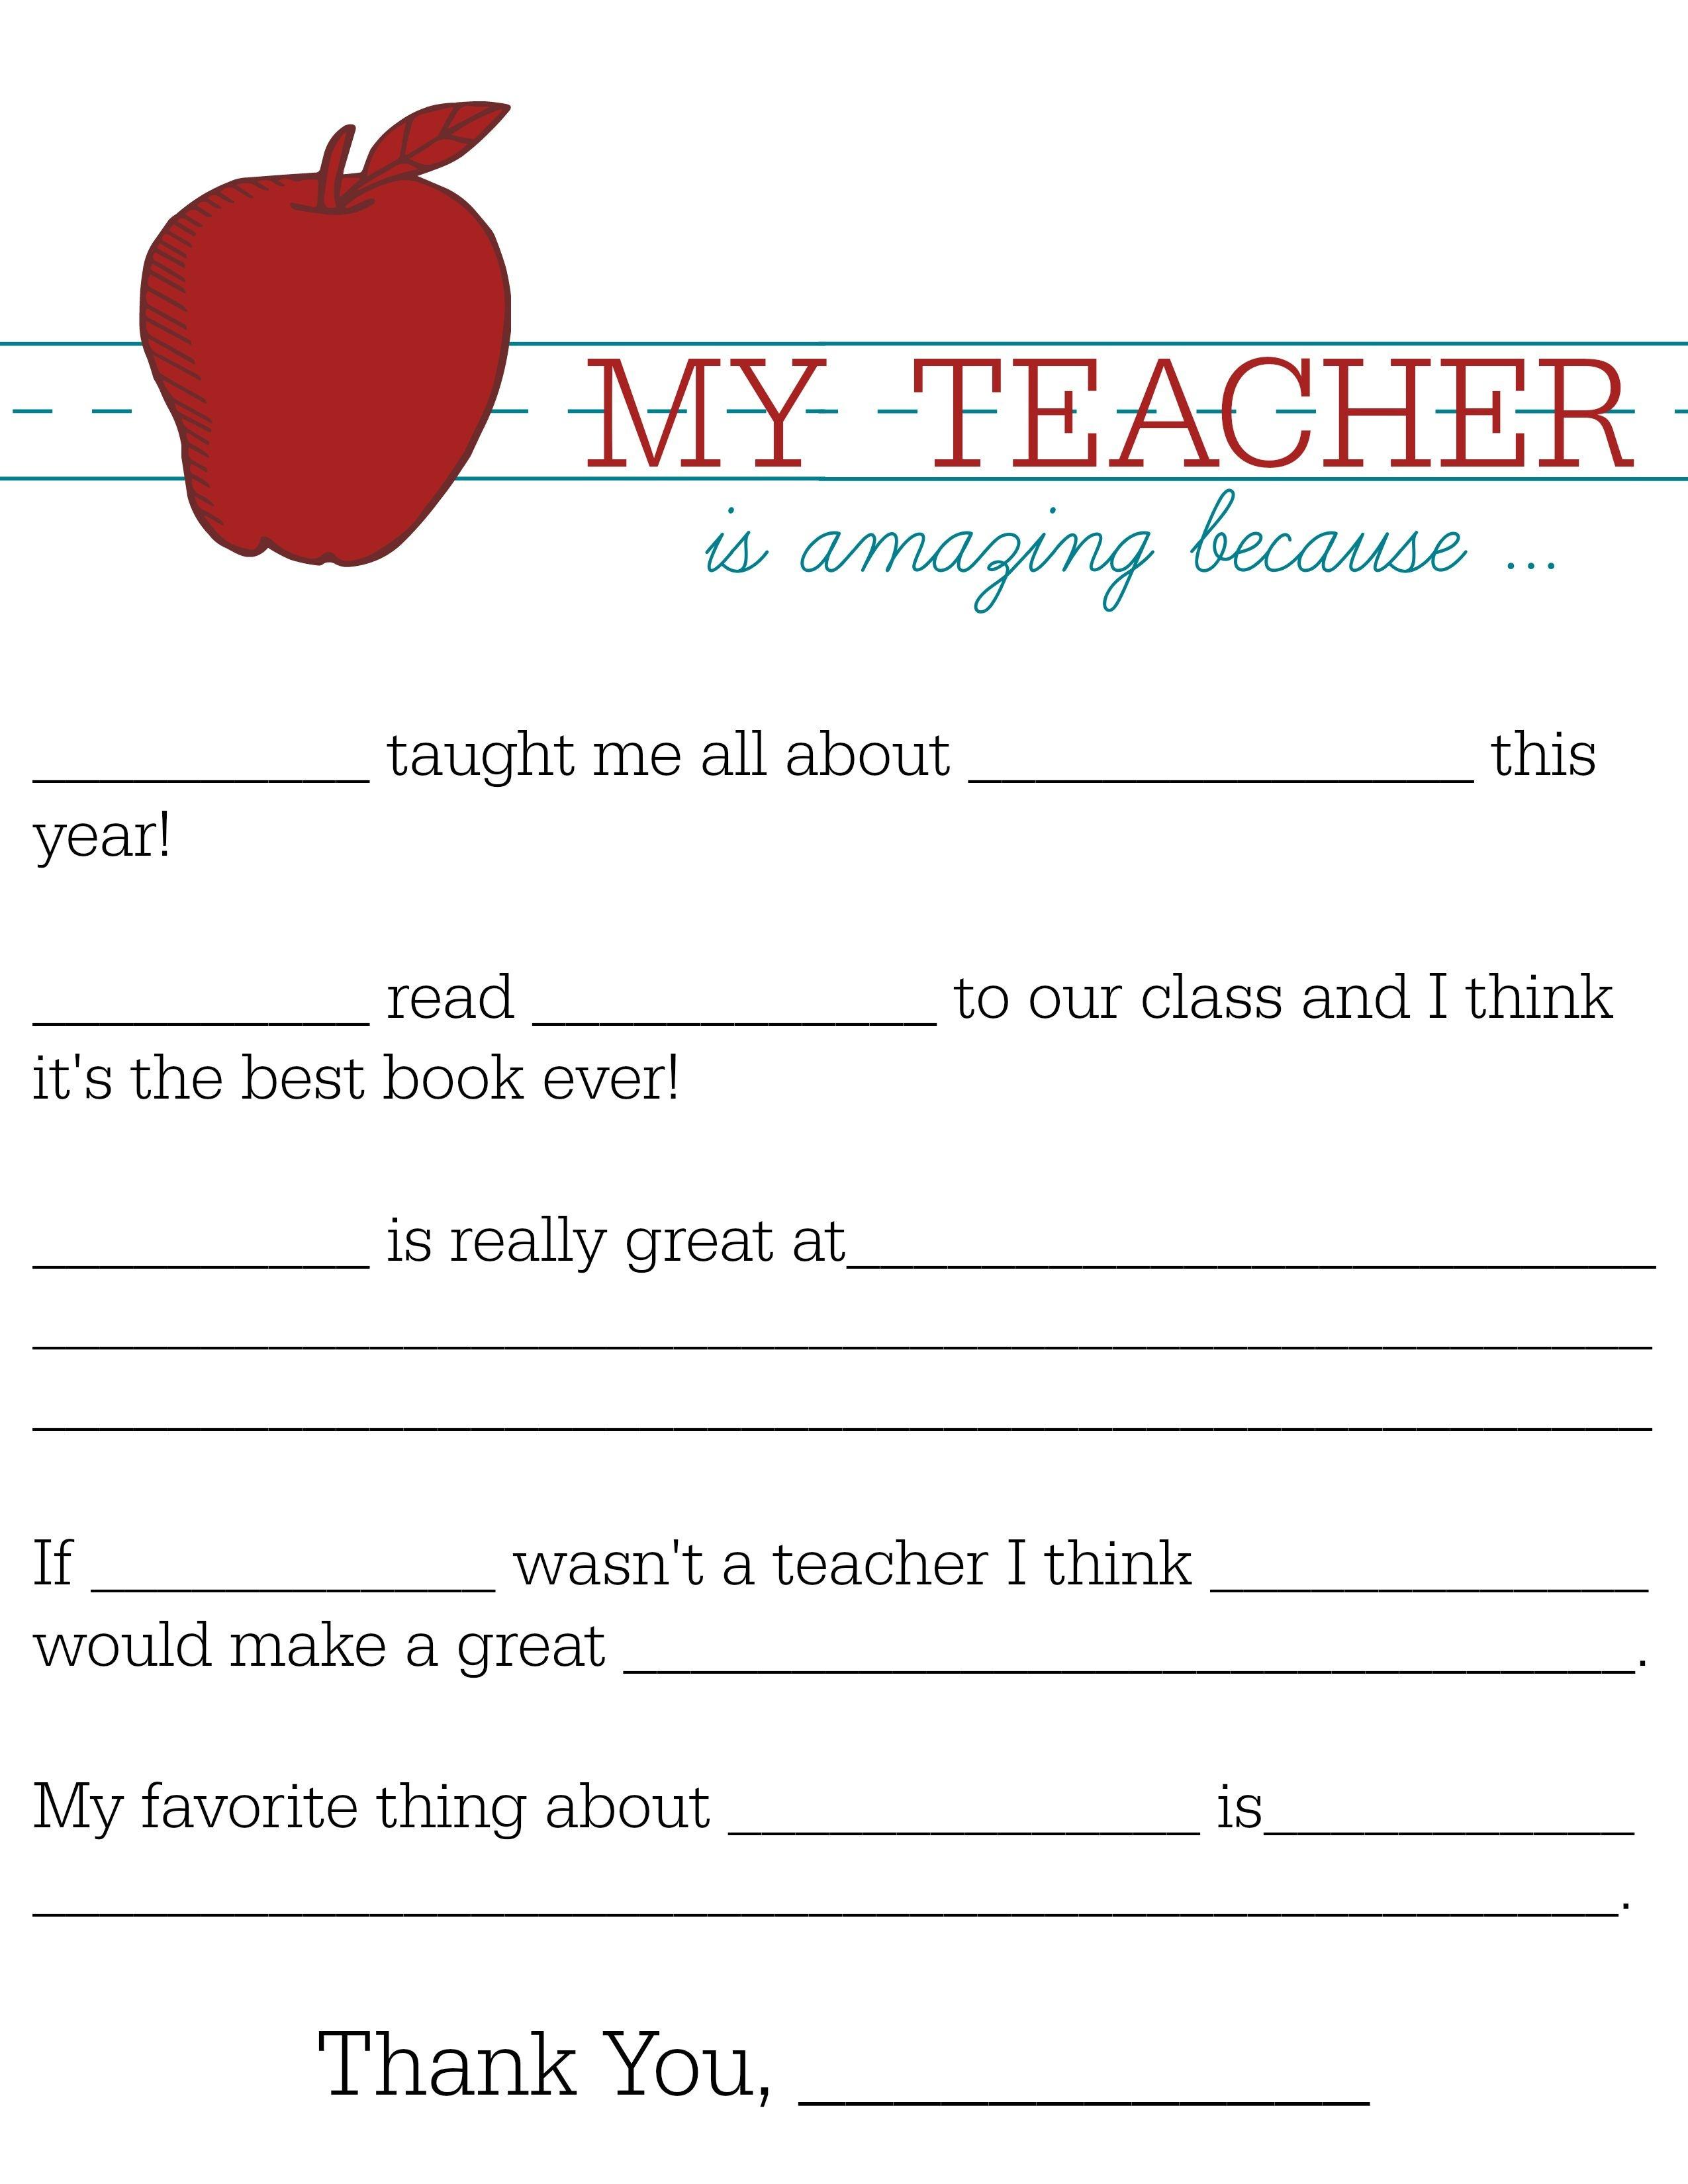 All About My Teacher | Parents: Raise A Reader Blog | Teacher - Free Printable Teacher Notes To Parents